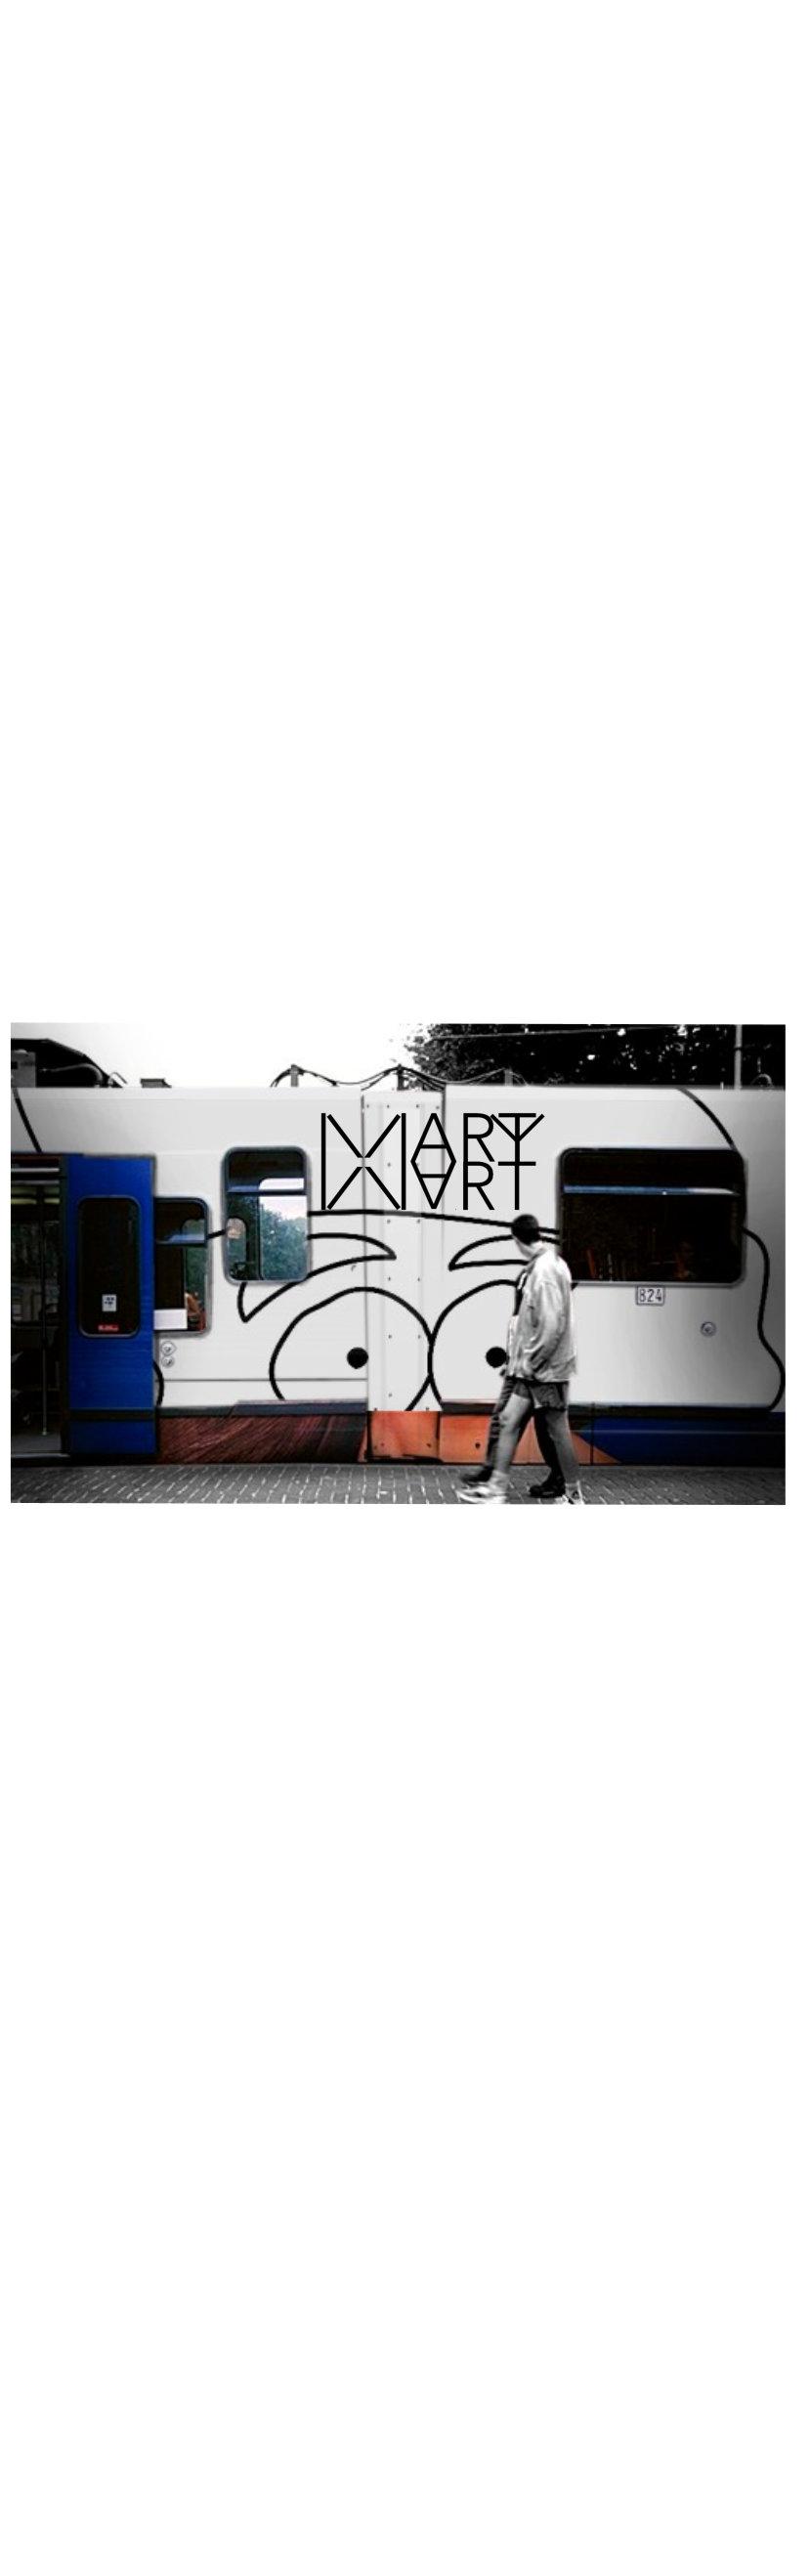 Train,graffiti